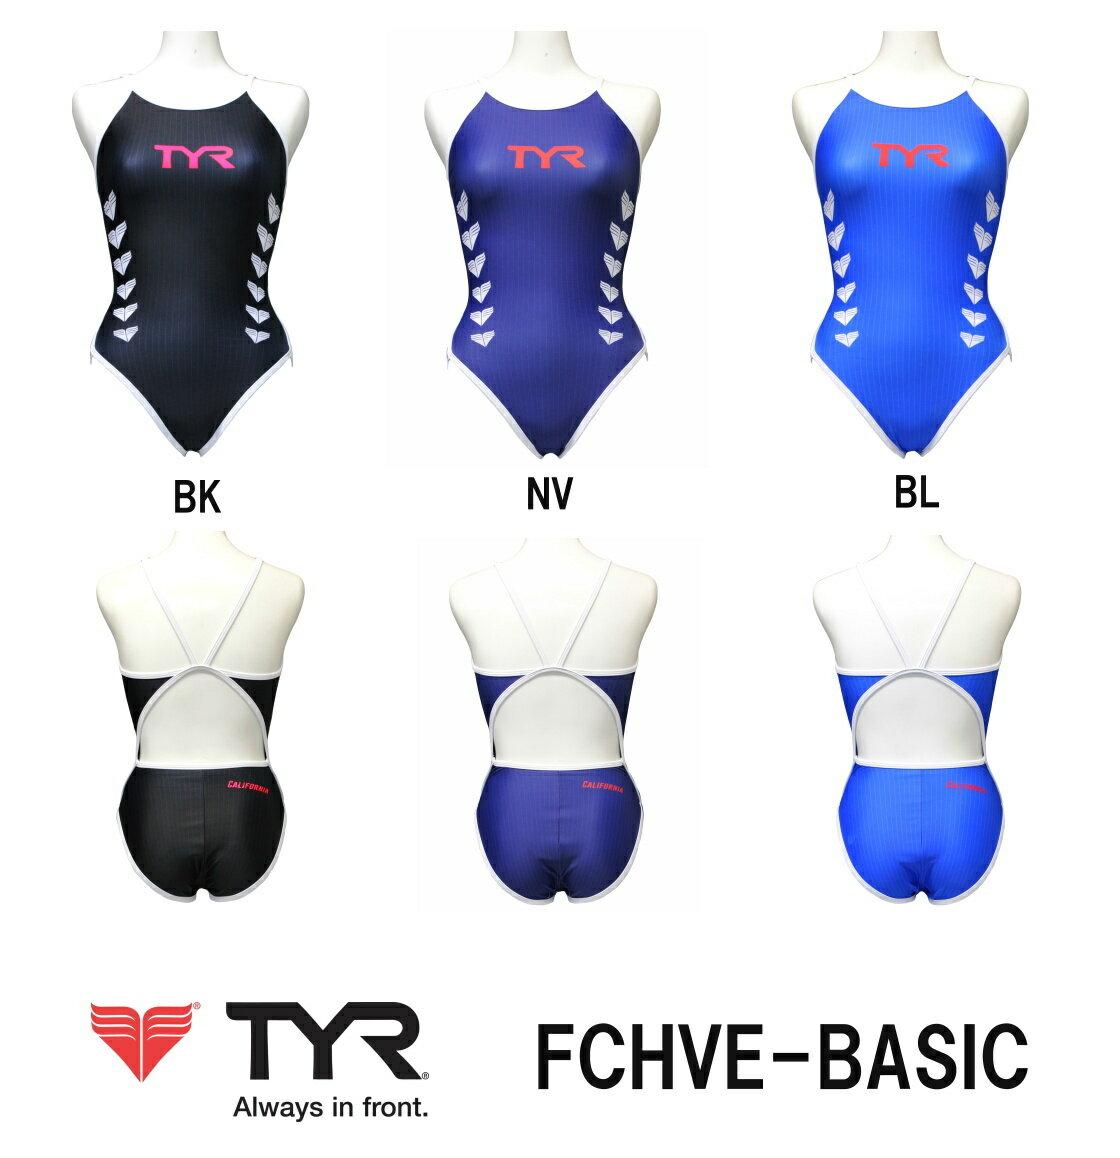 TYR ティア トレーニング水着 レディース スイムウェア スイミング ウィメンズフレックスバック ANYTIME CHEVRON エニィタイム シェブロン FCHVE-BASIC